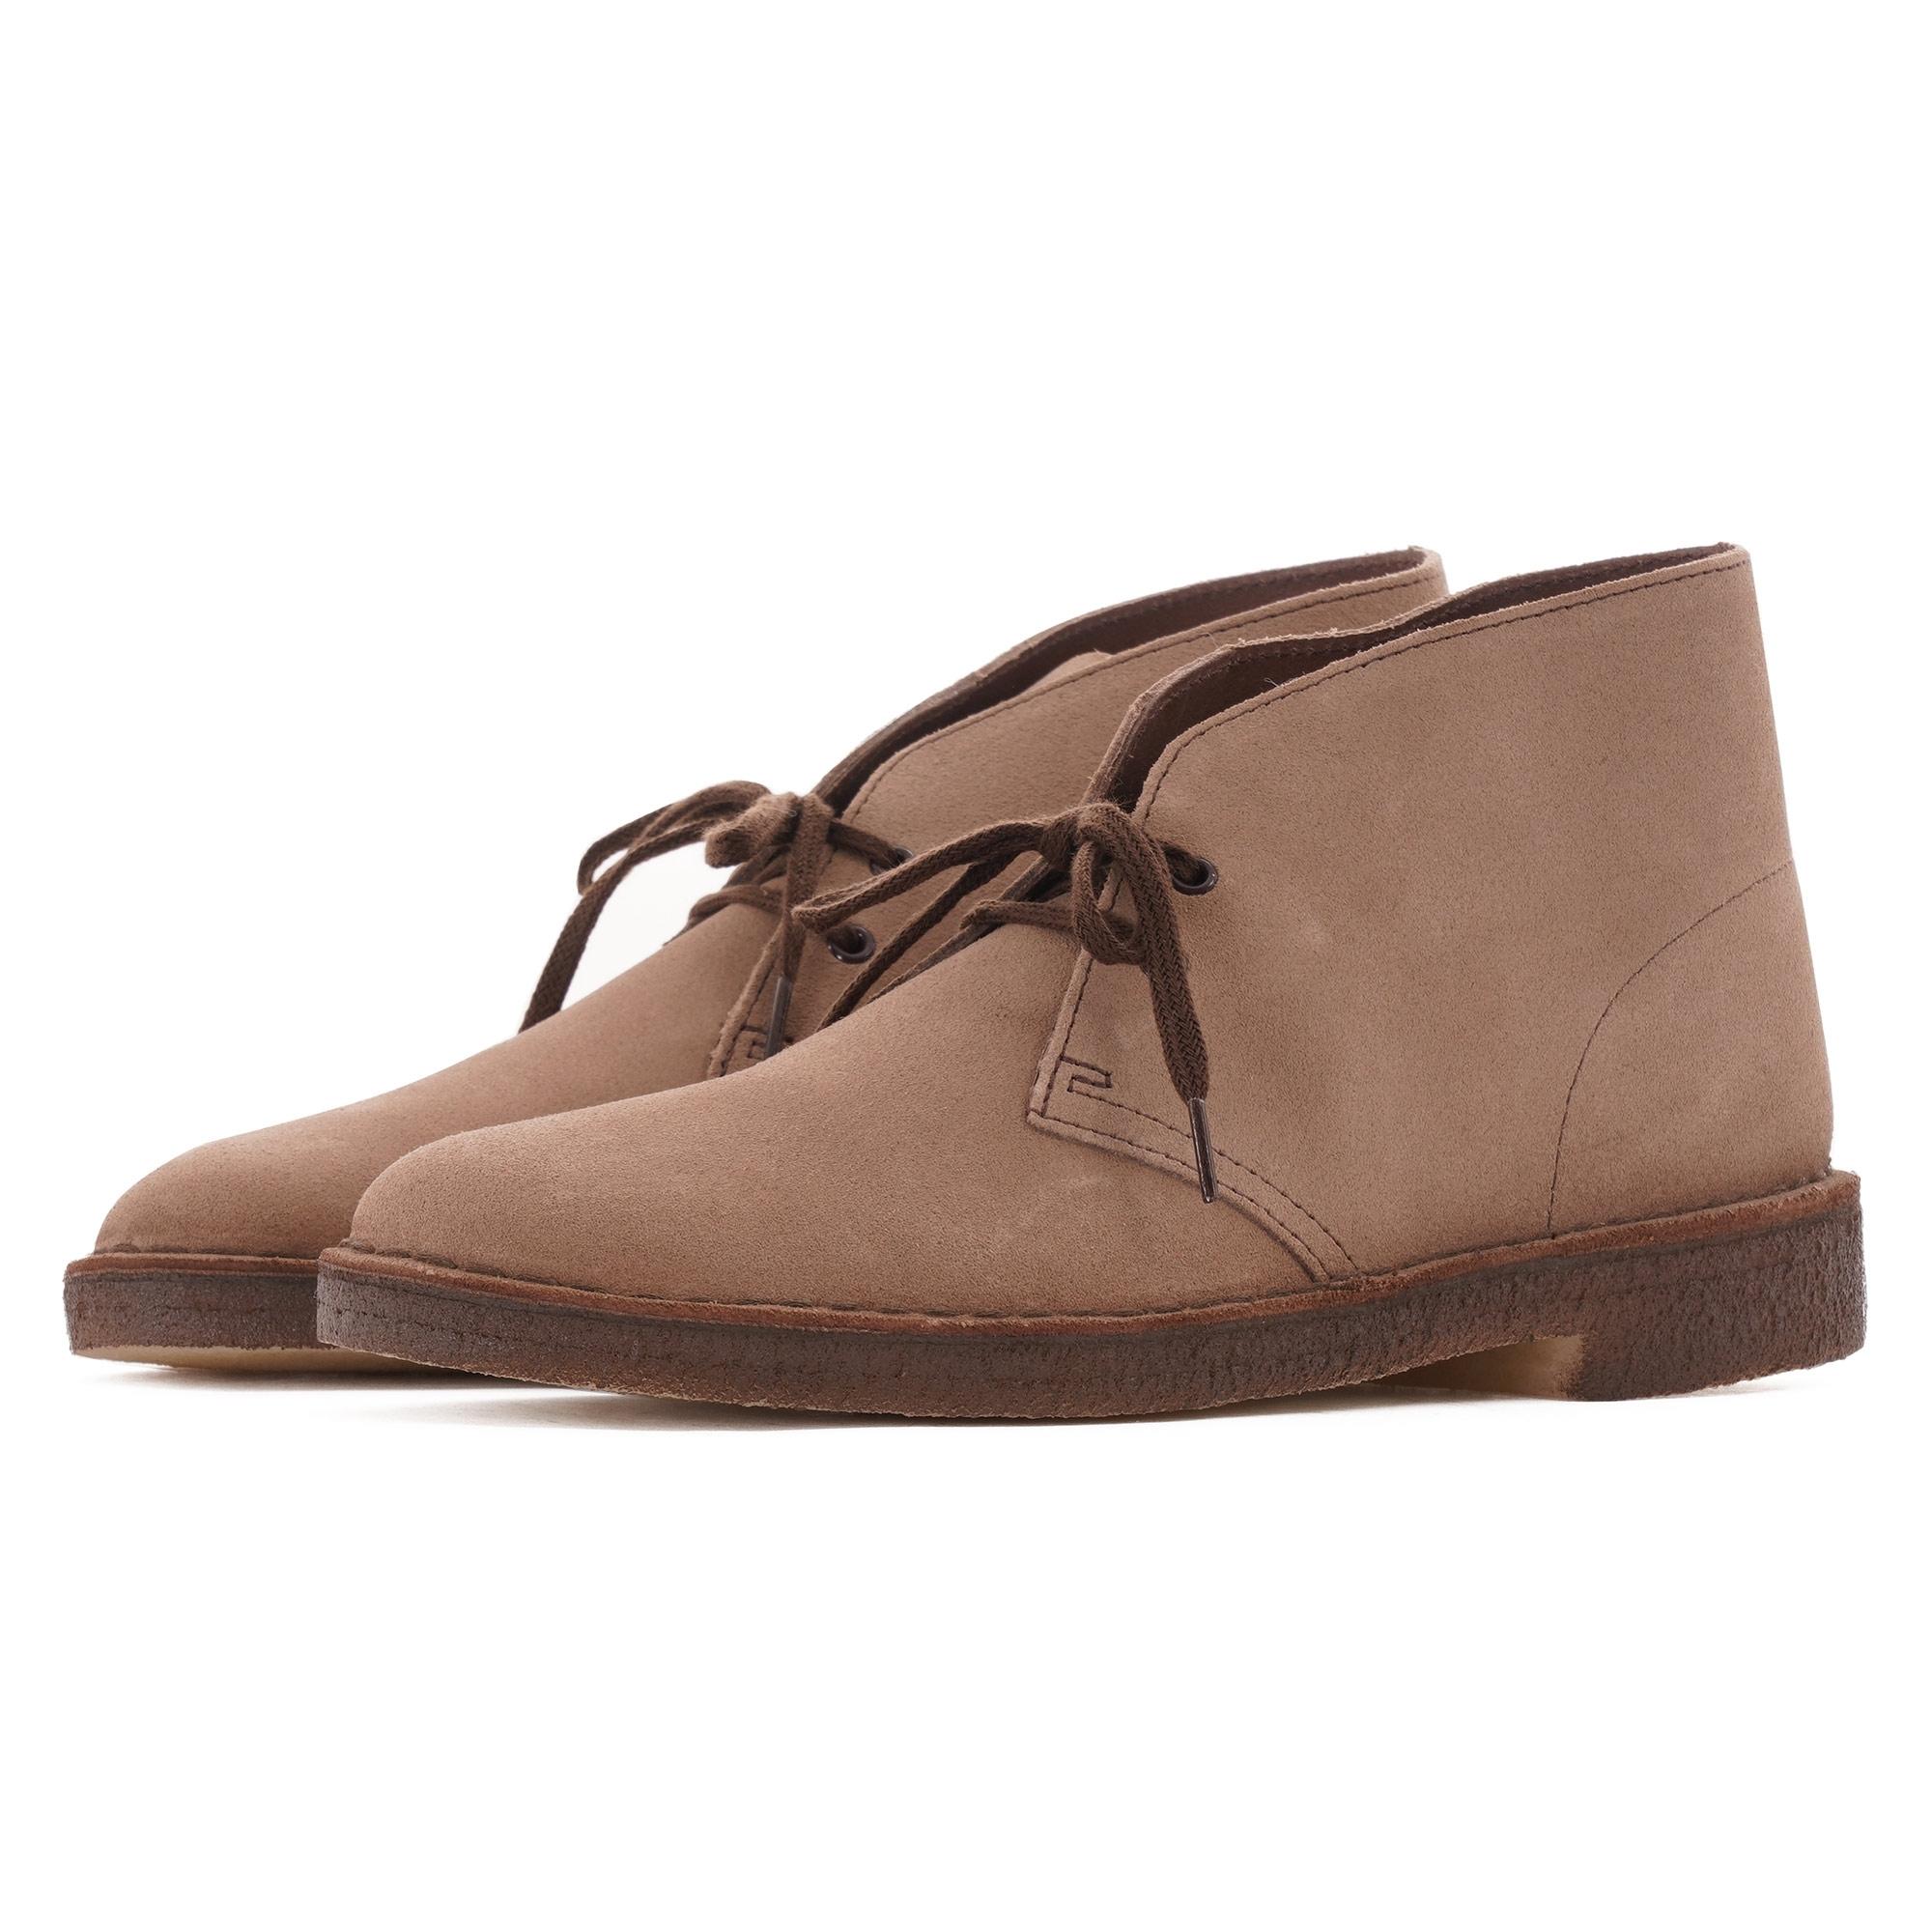 Boot lace up Clarks Originals Desert Boot brown suede